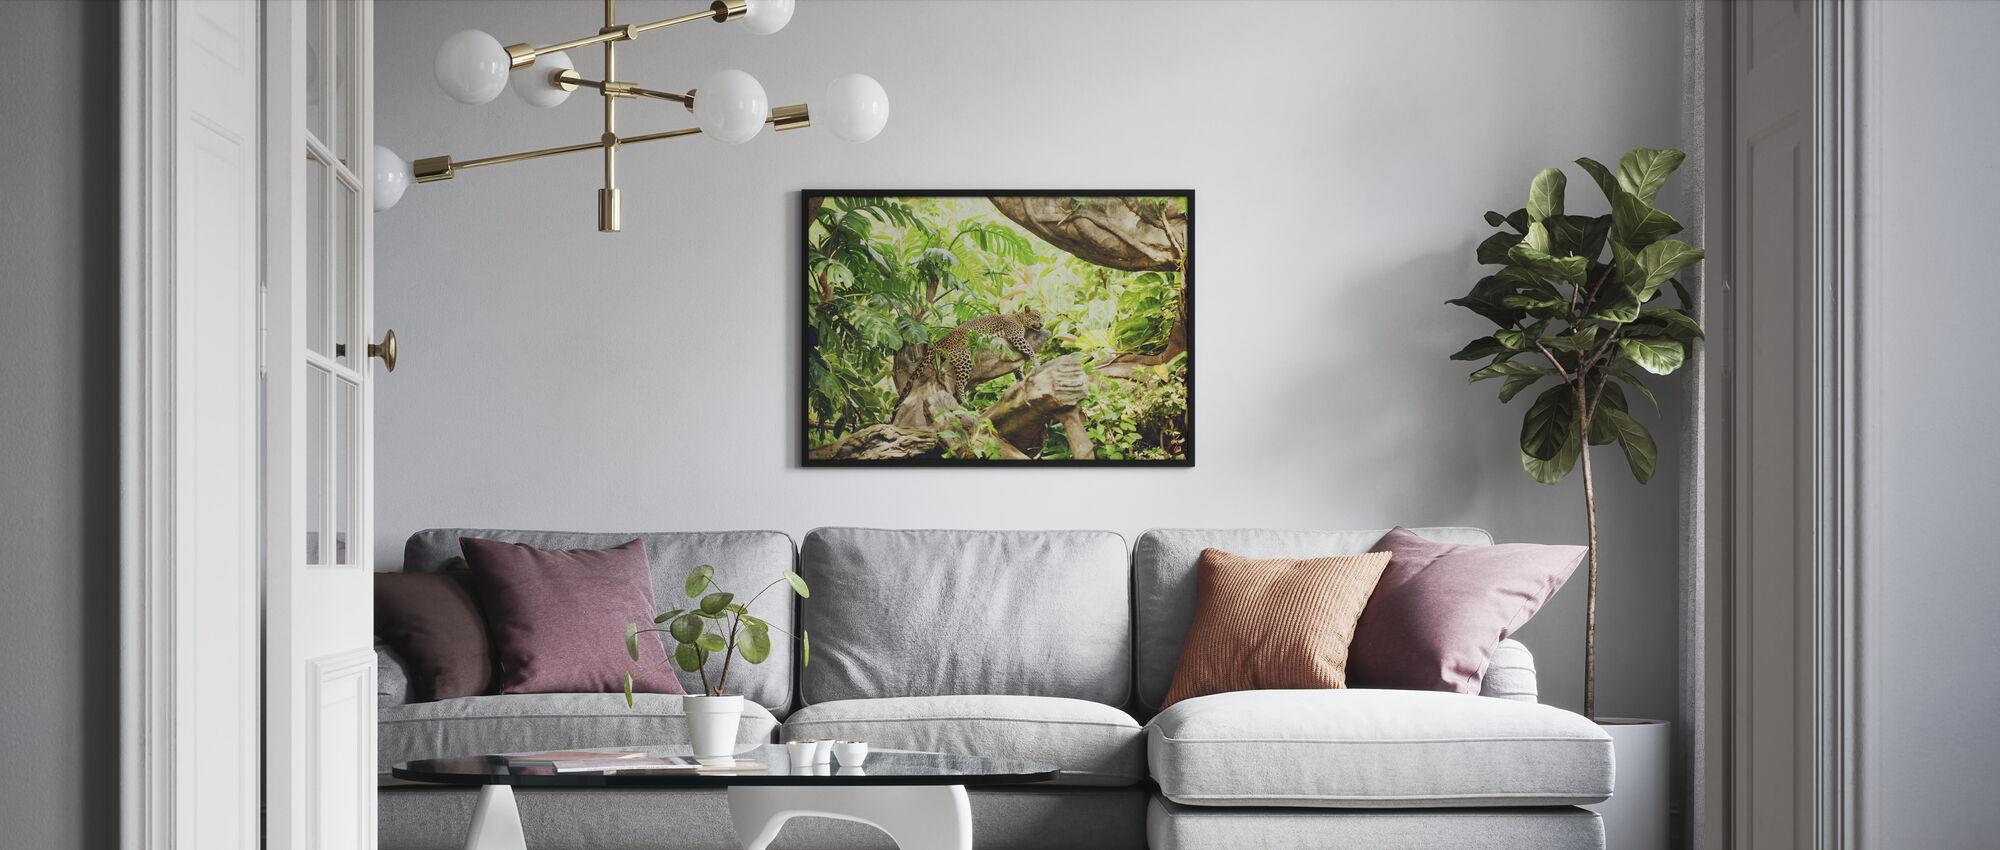 Leopard Dozing in the Jungle - Framed print - Living Room